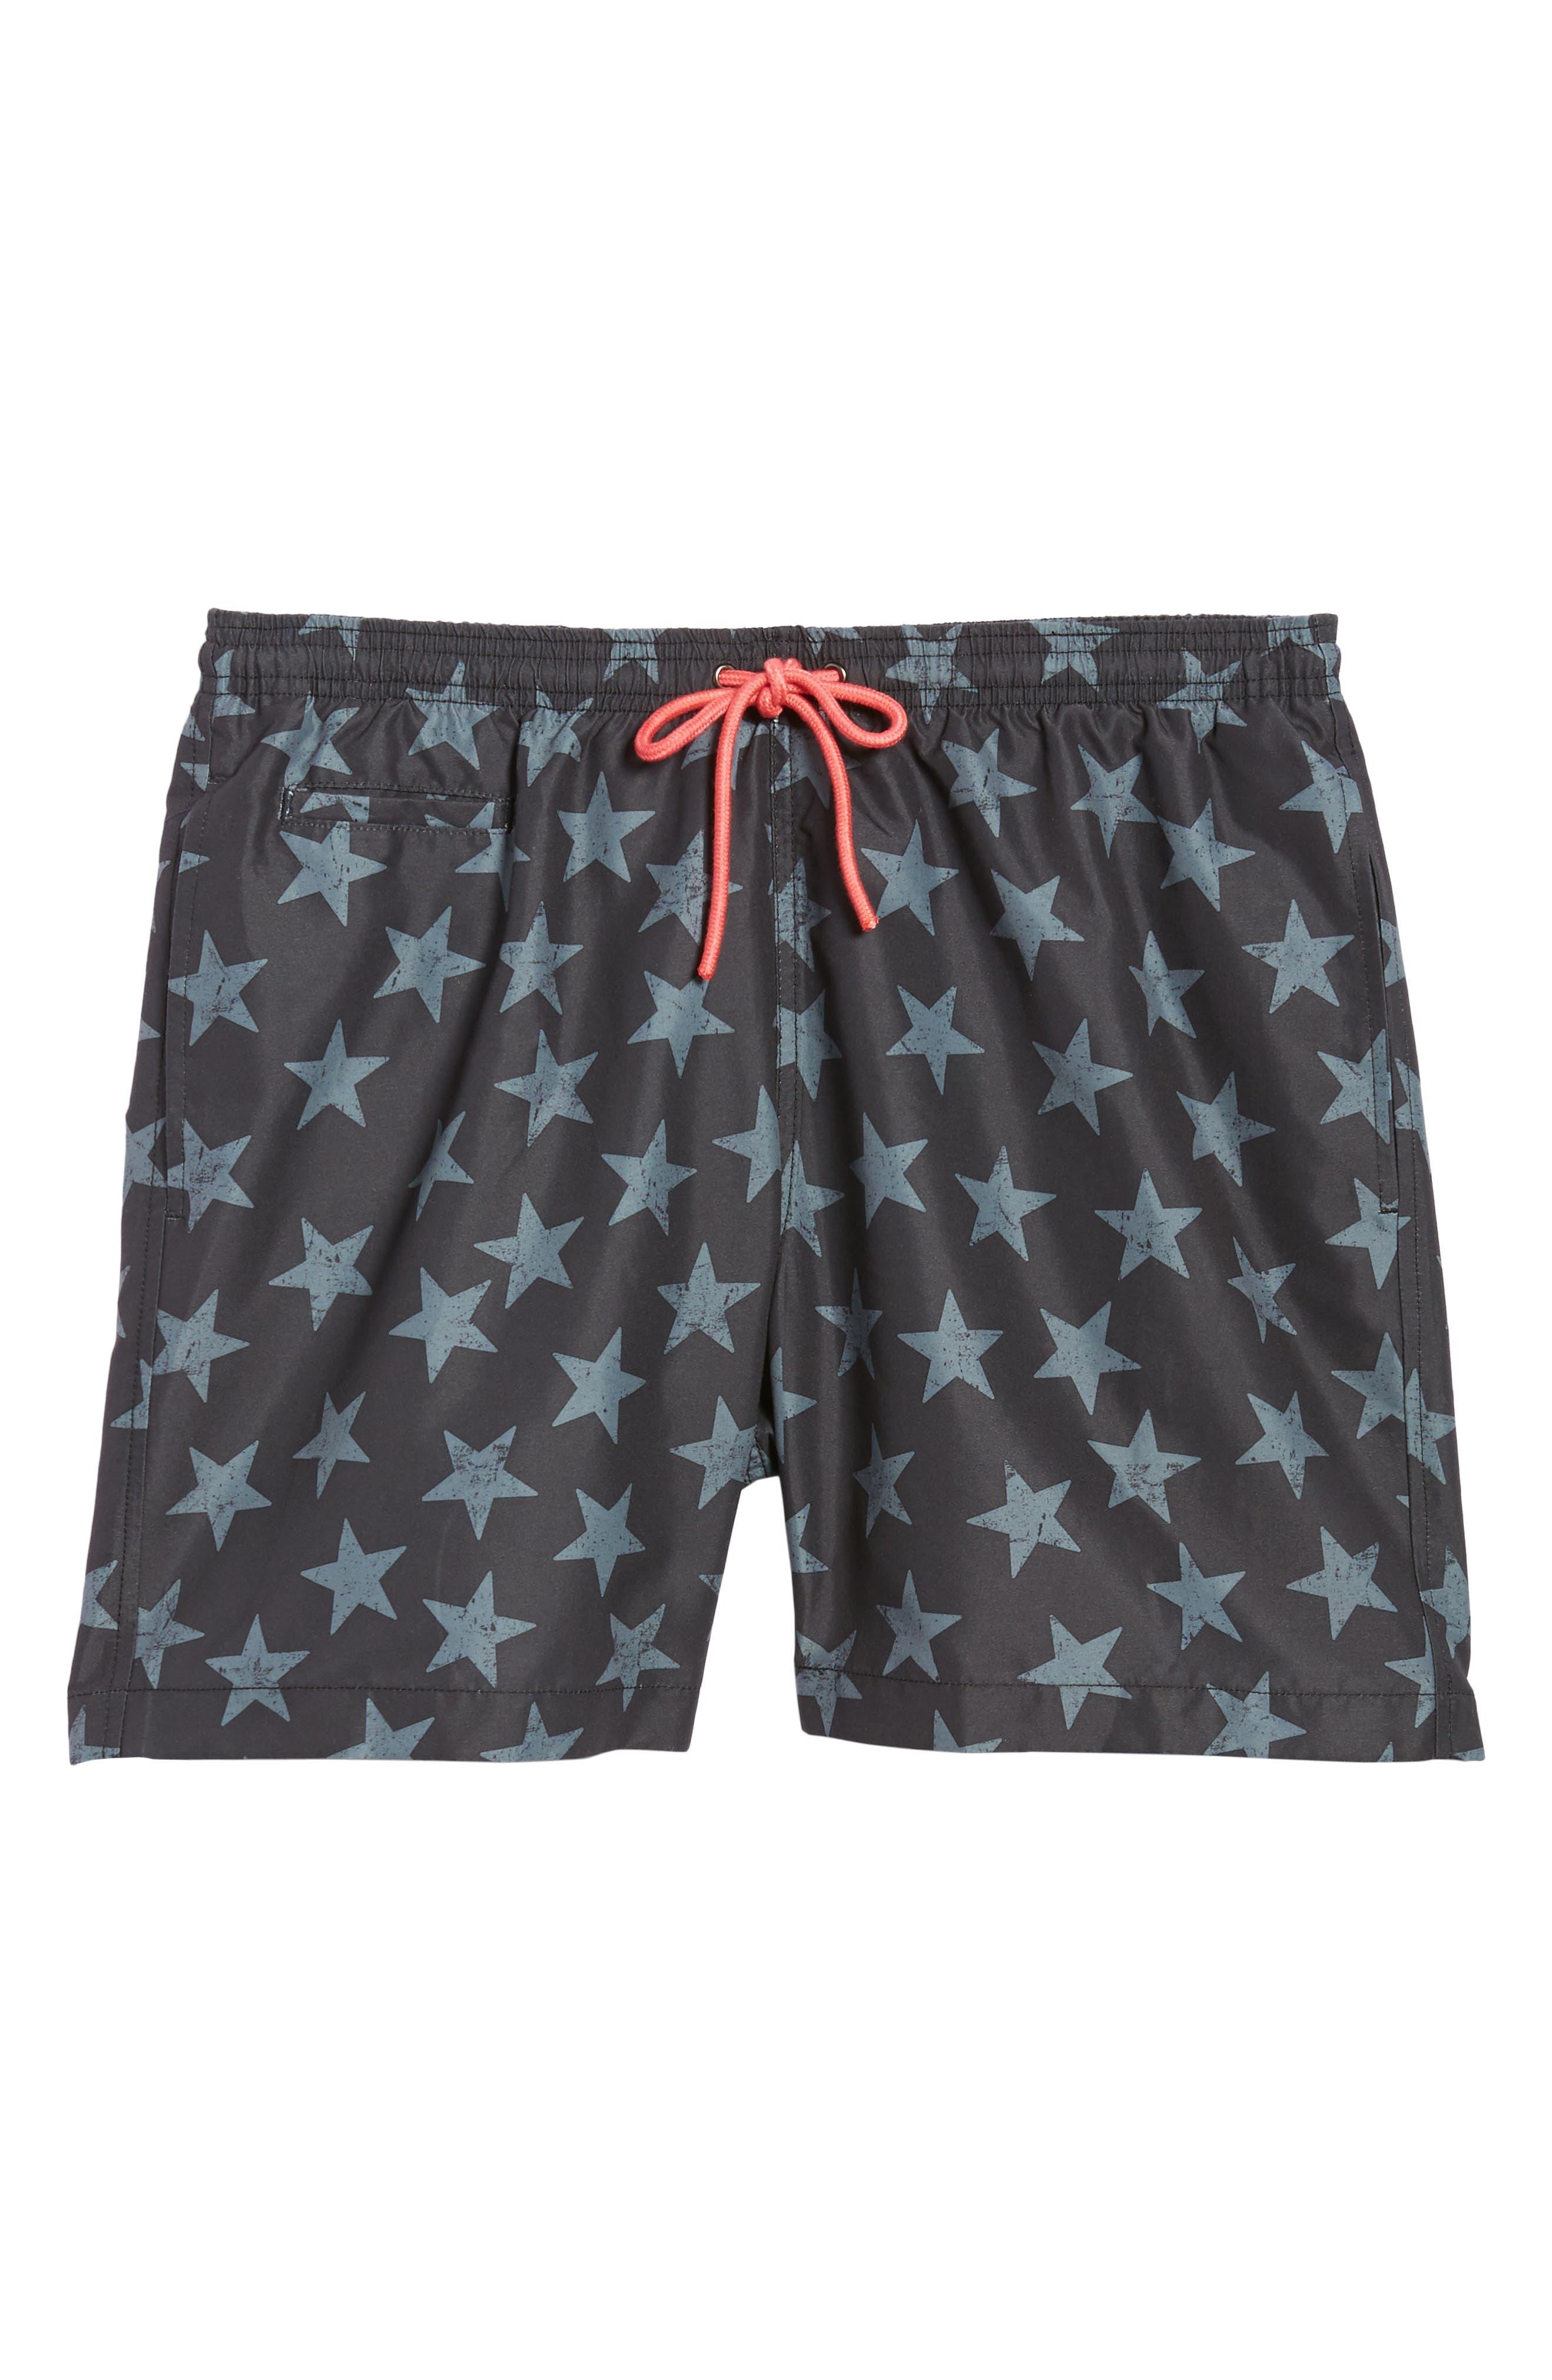 San O Stars Swim Trunks,                             Alternate thumbnail 6, color,                             Black/ Steel Grey